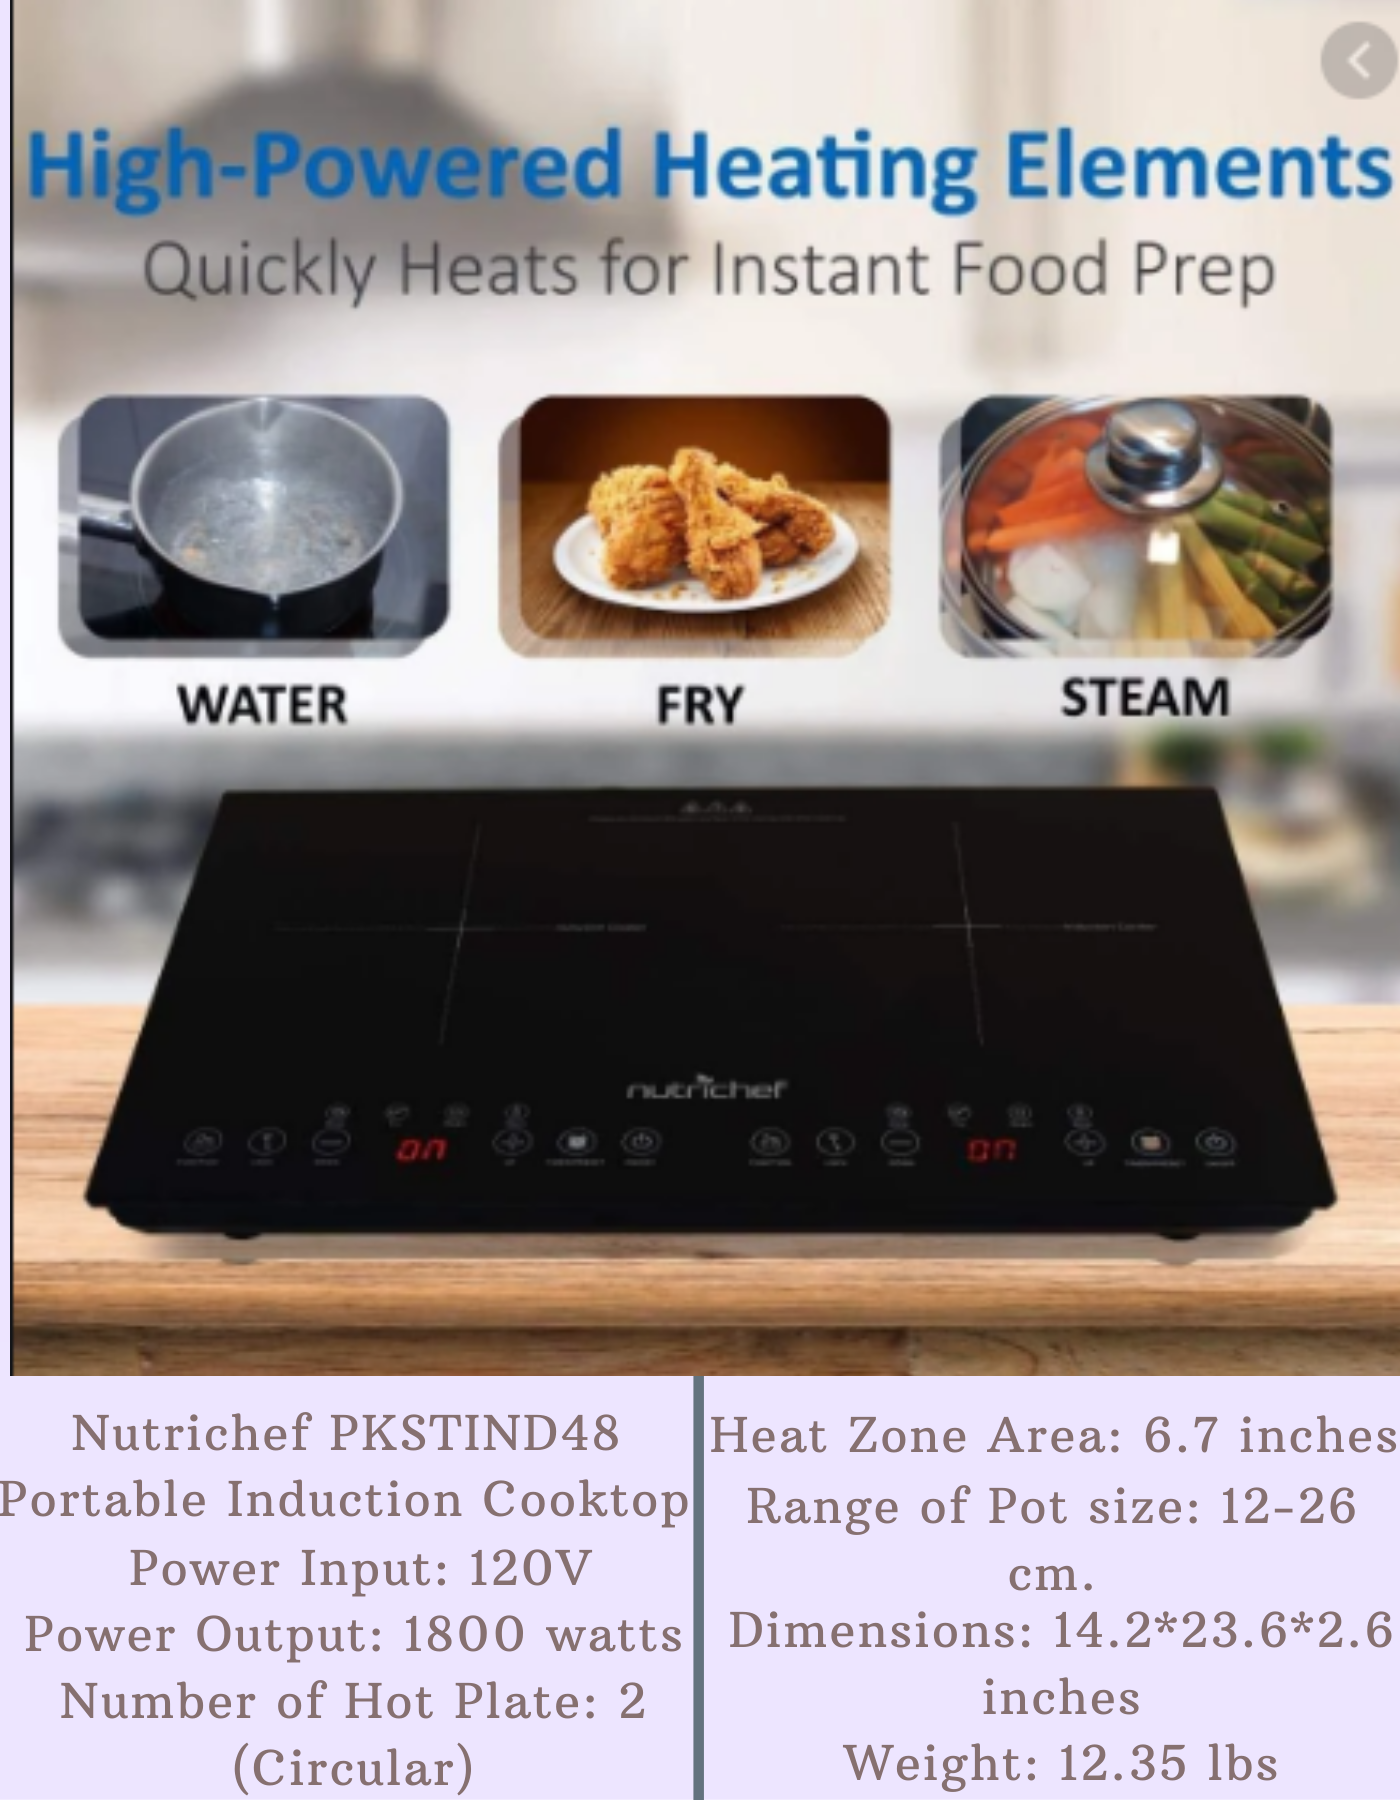 Nutrichef Pkstind48 Portable Induction Cooktop In 2020 Induction Cooktop Electric Stove Cooktop